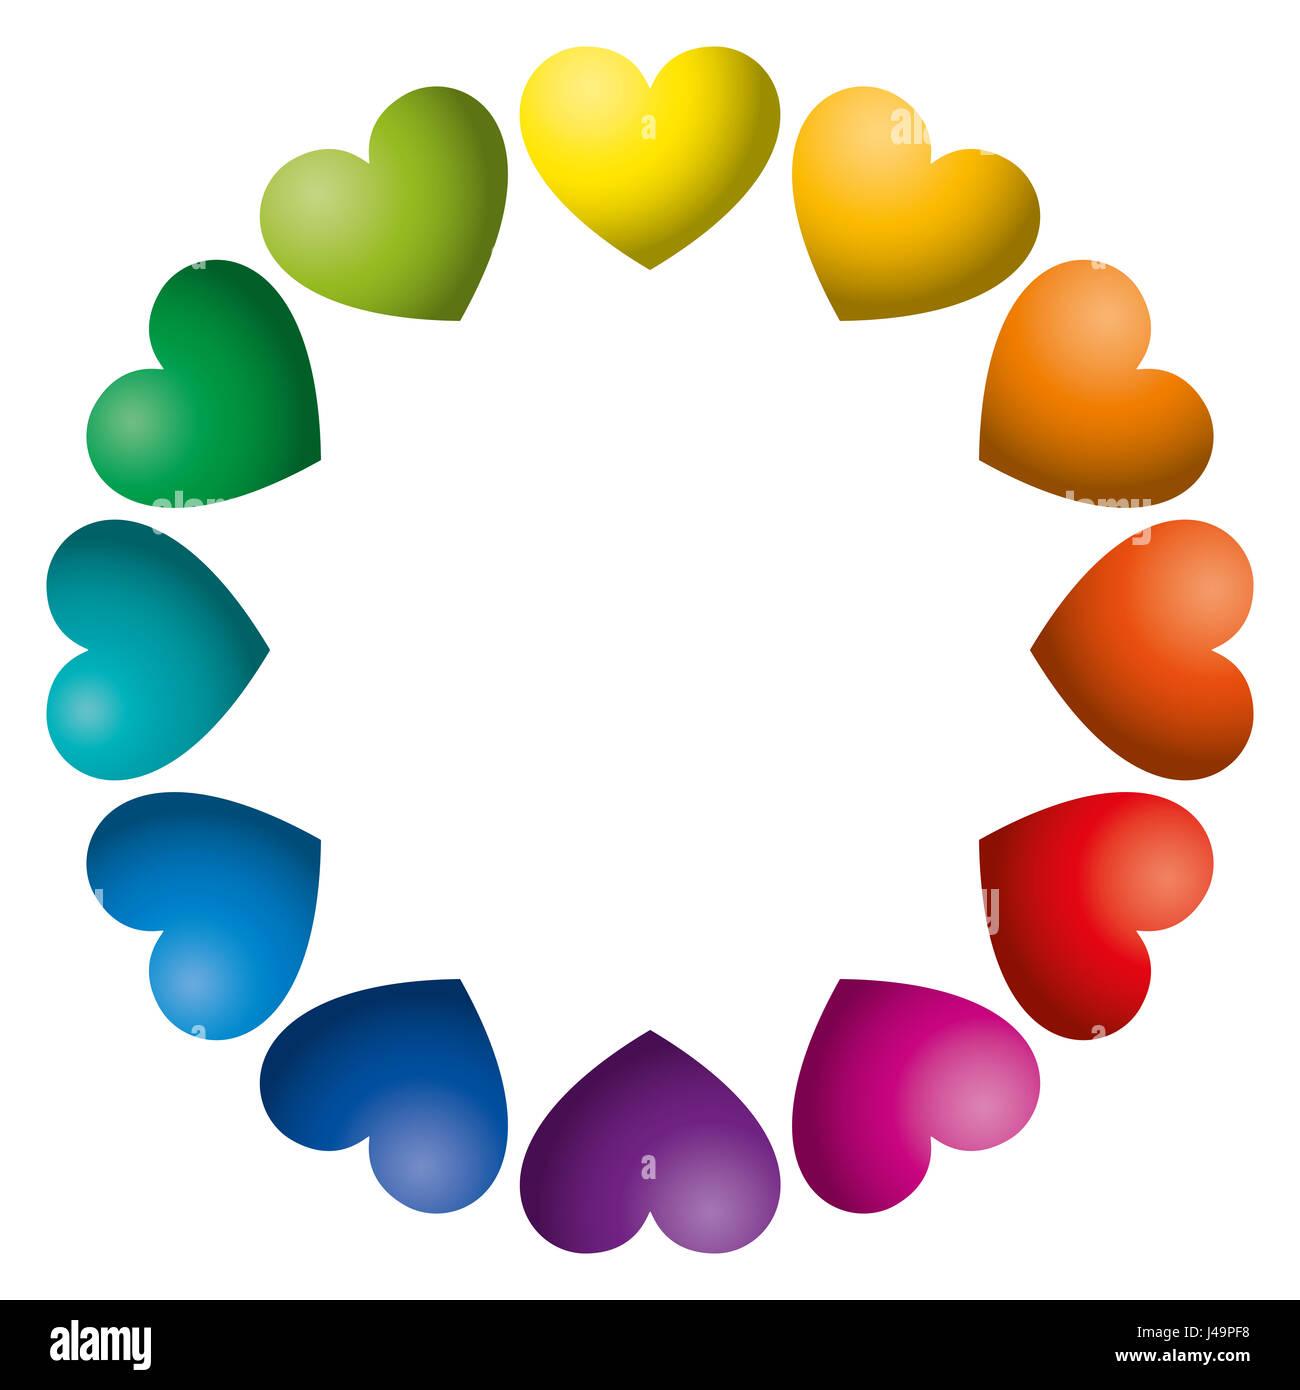 Rainbow color hearts arranged in a circle twelve heart symbols in rainbow color hearts arranged in a circle twelve heart symbols in unique color hues biocorpaavc